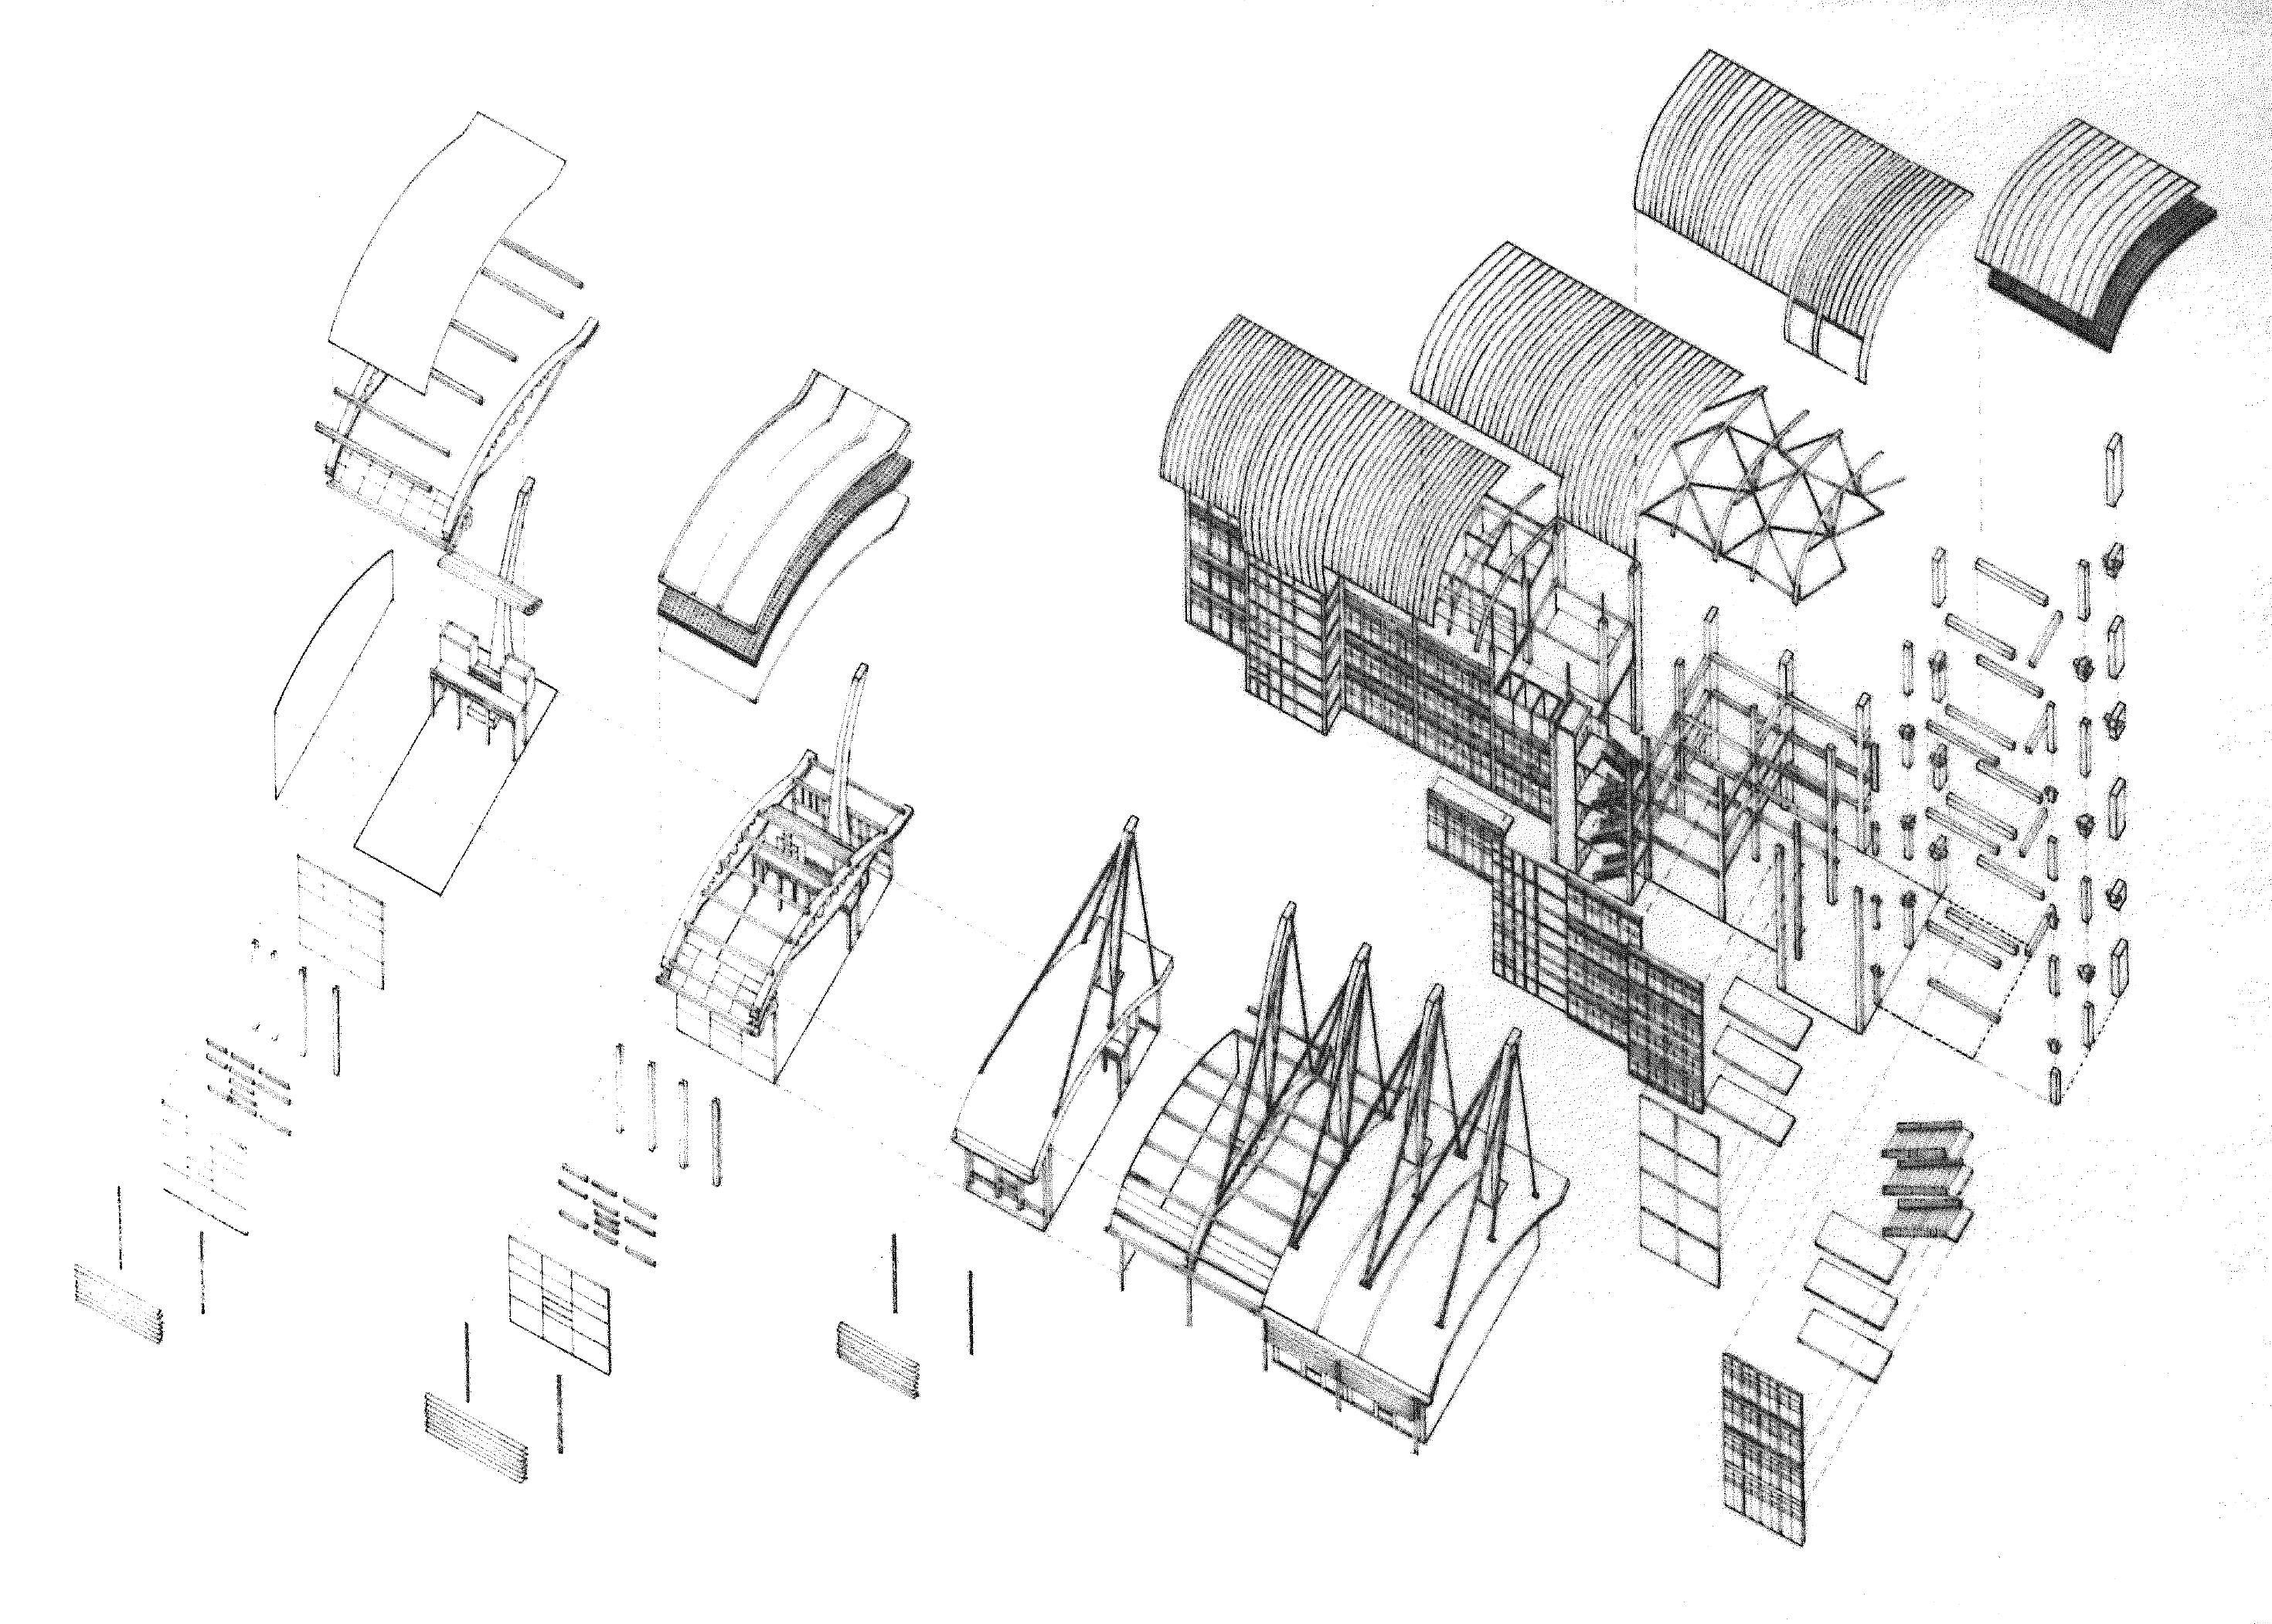 Arch Student Portfolios: My Top 3 Tips | Hawkins Architecture